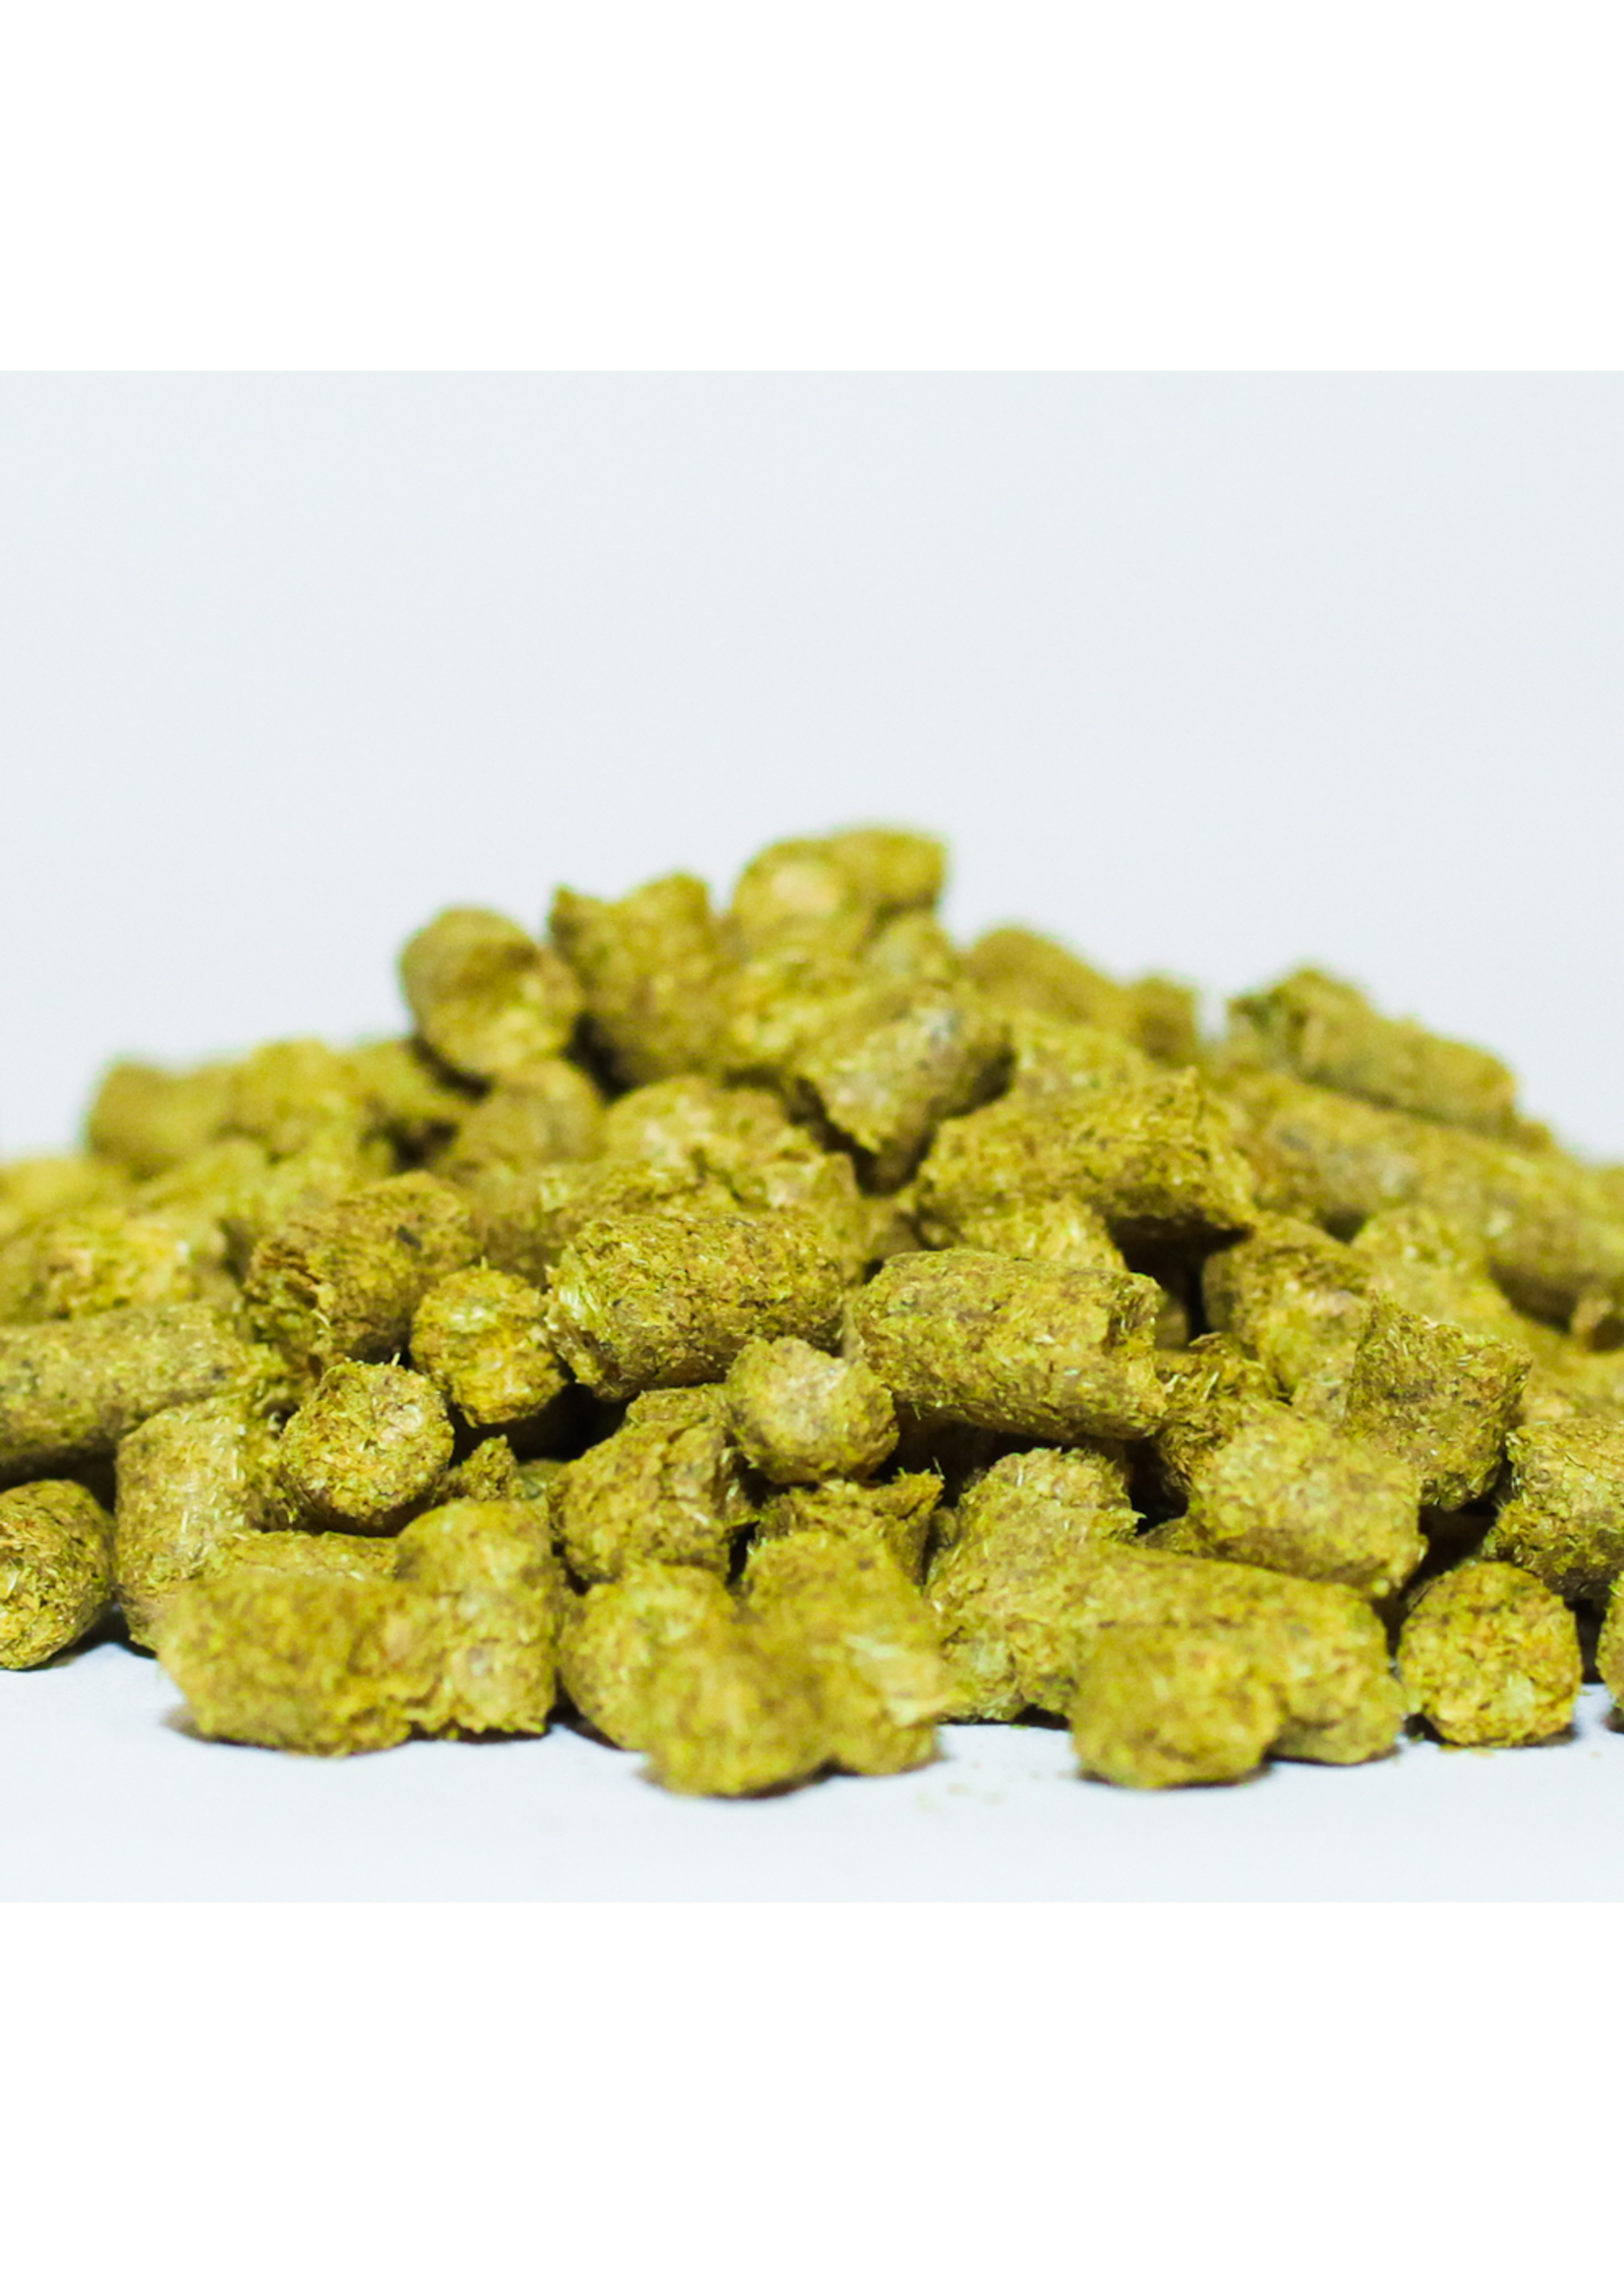 Hops Amarillo Hops (US) - Pellets - 1 oz